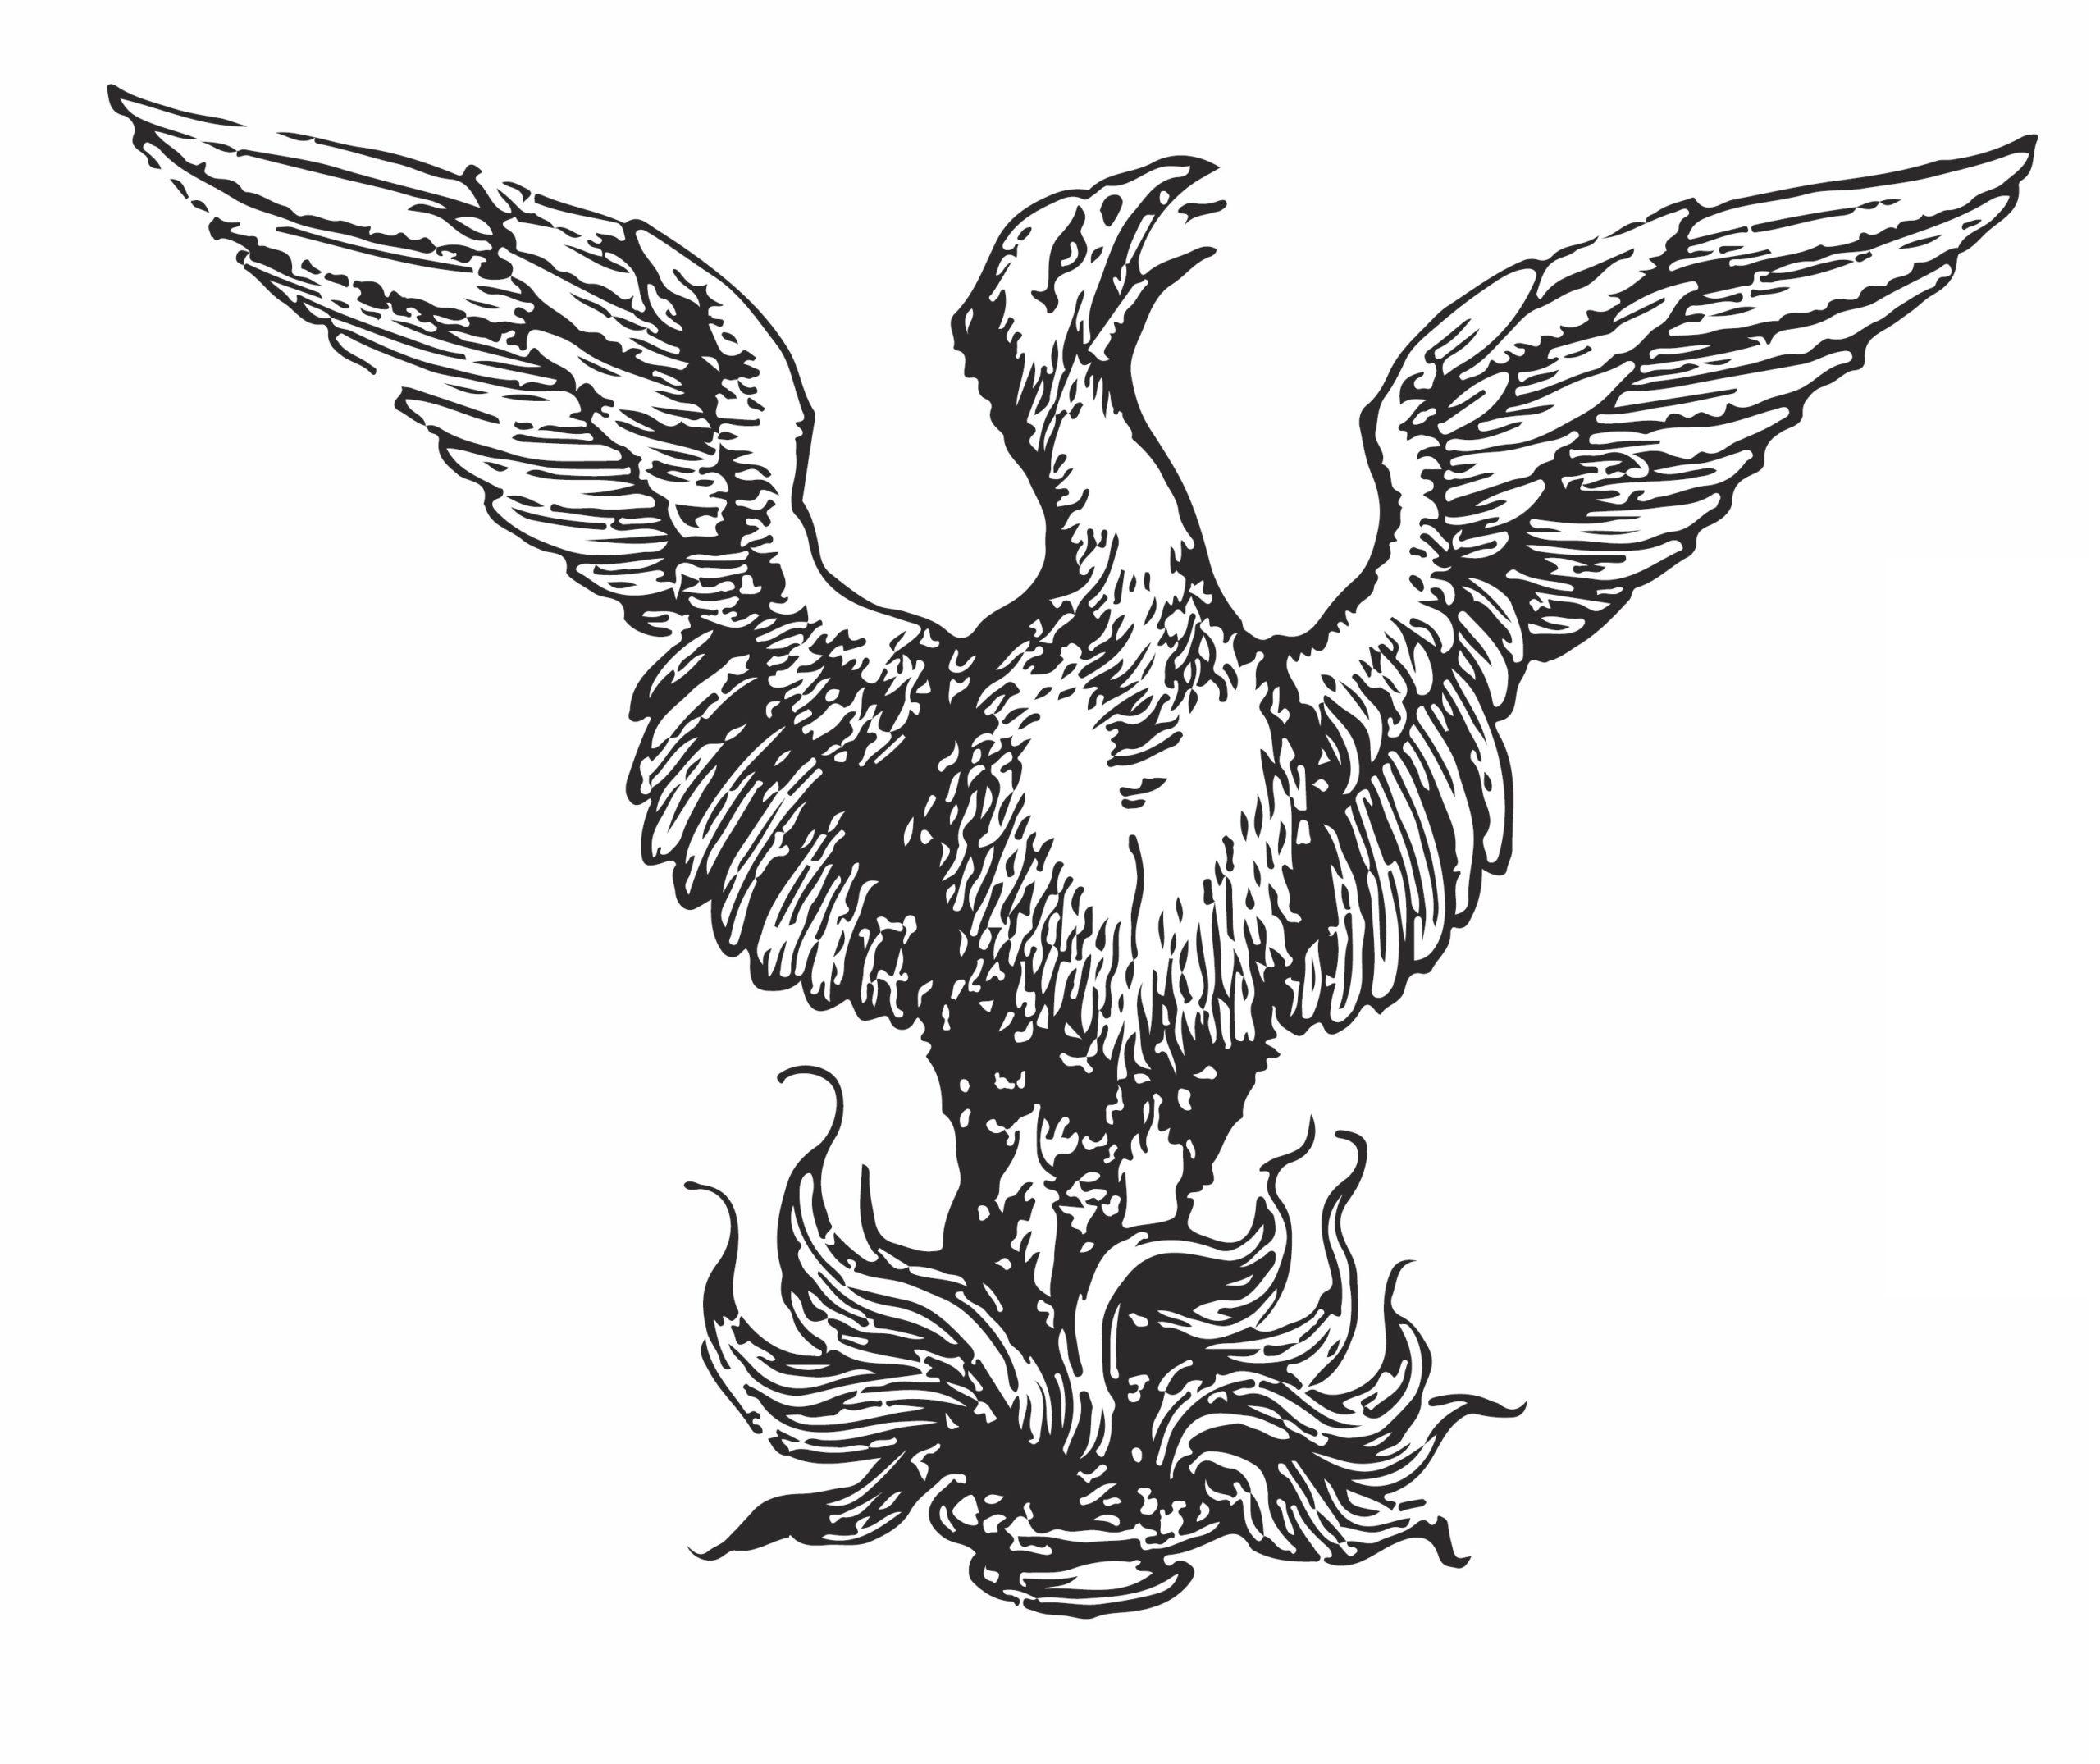 SRS Phoenix Logo White Background jpg 402 KB, 2560 by 2150 pixels